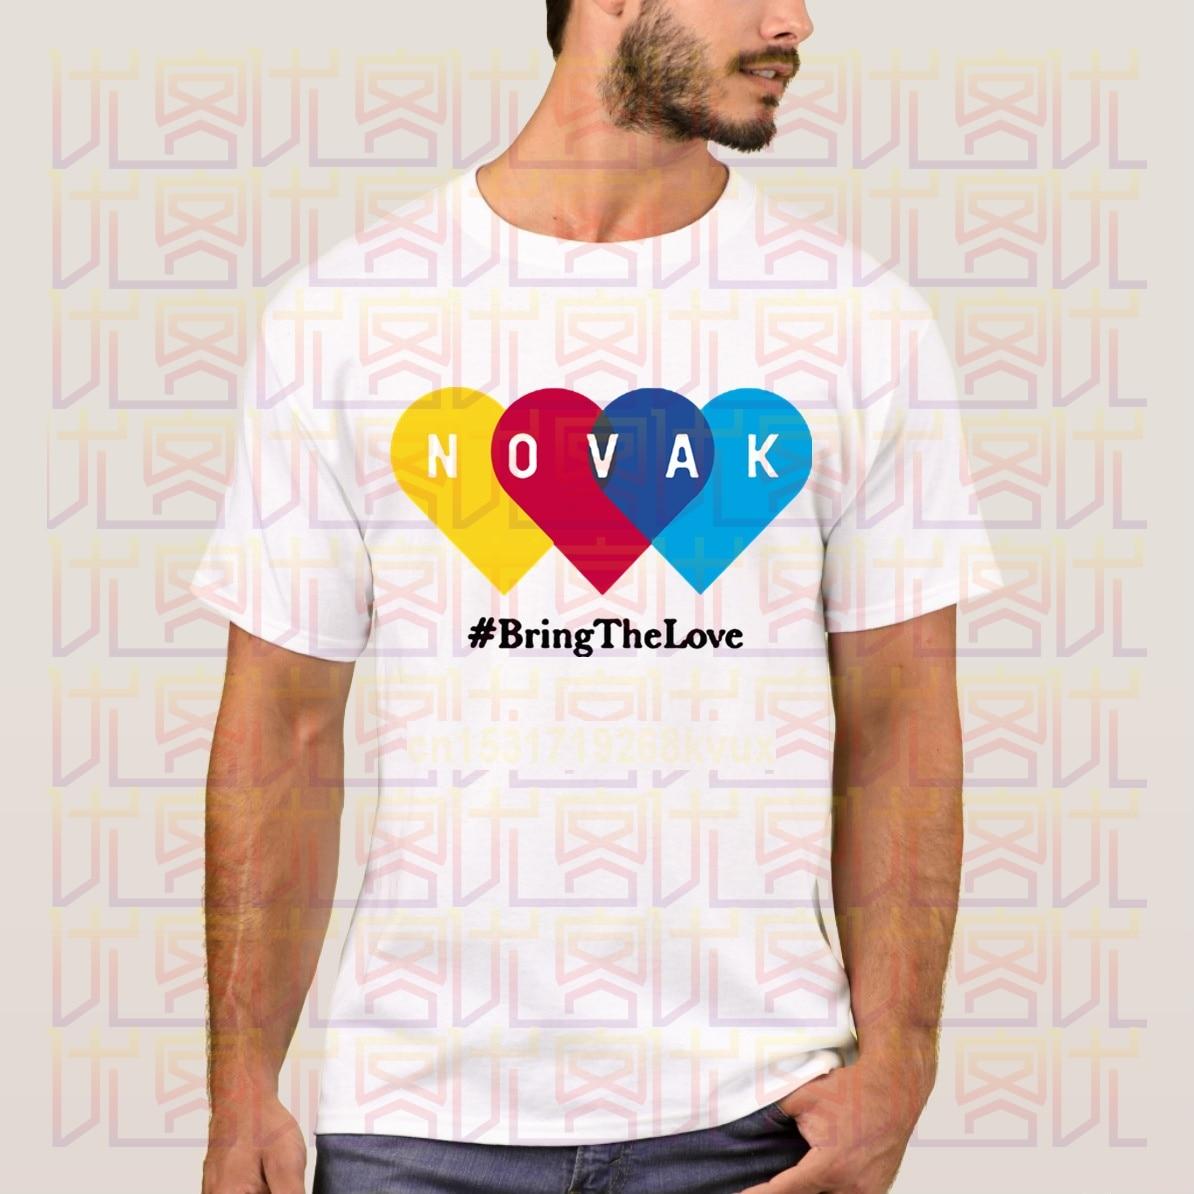 Новейшая летняя футболка с логотипом Novak Bring The Love Grand Slam US Open Wimbledon Championshi, 100% Повседневная хлопковая футболка, 2020